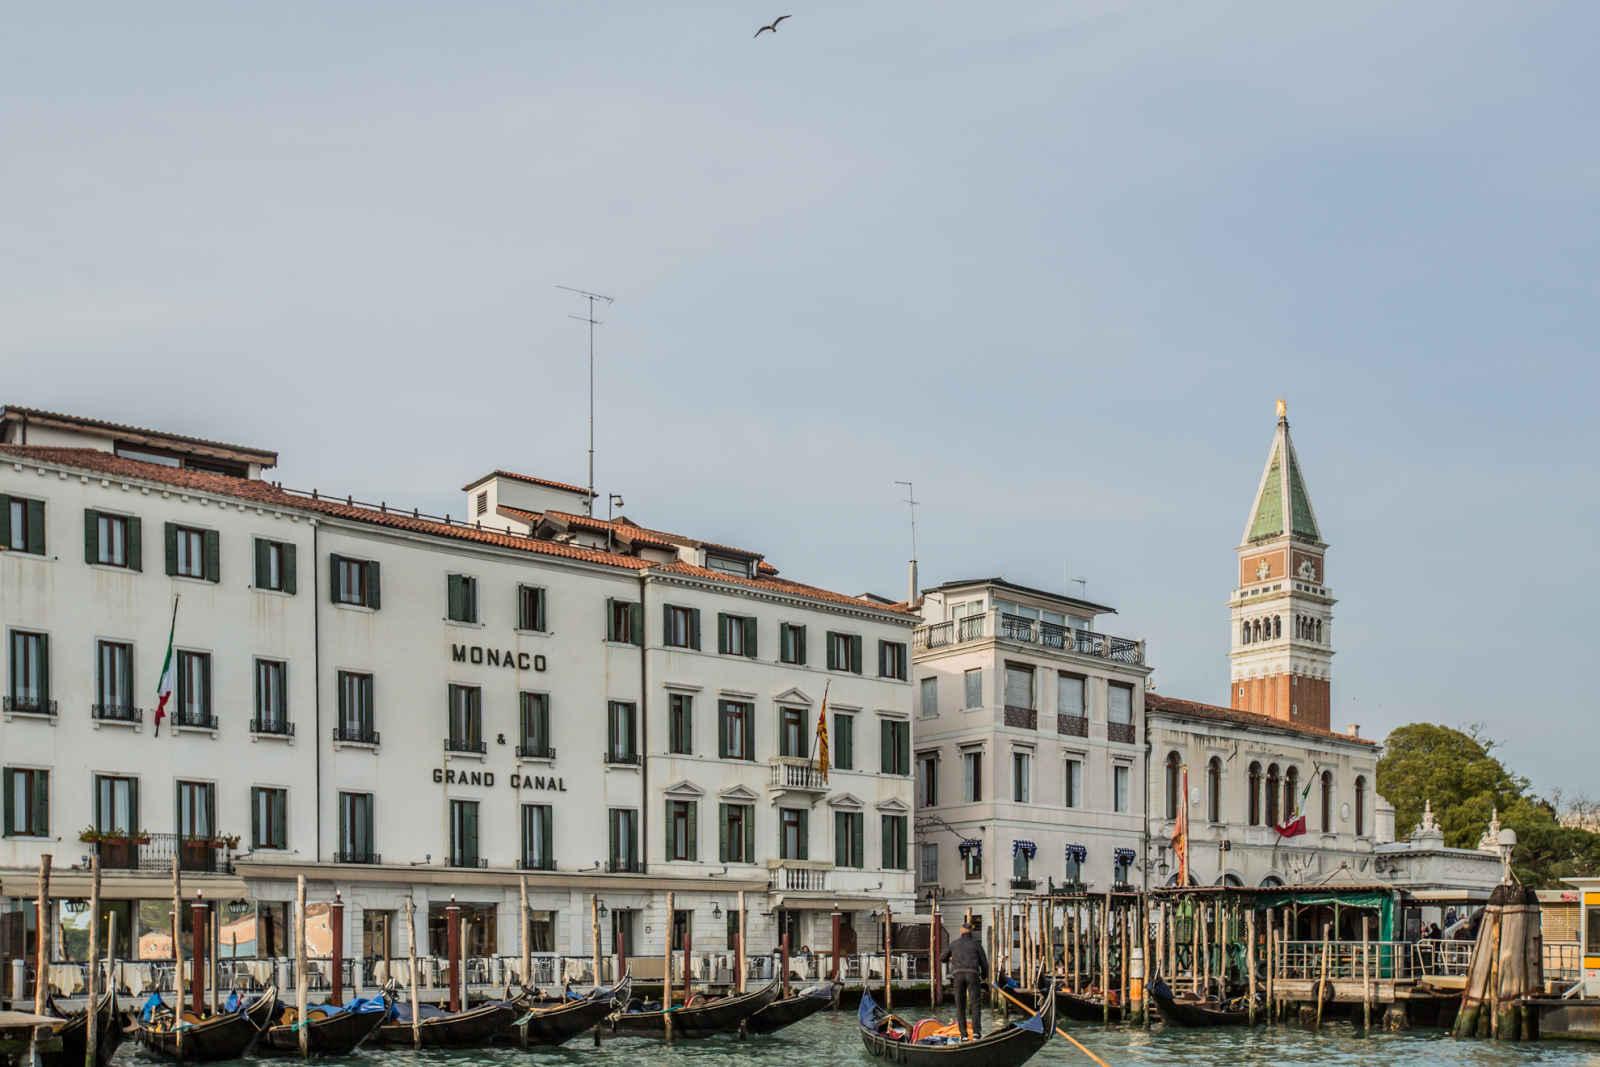 Séjour Italie - Hotel Monaco & Grand Canal - 4*